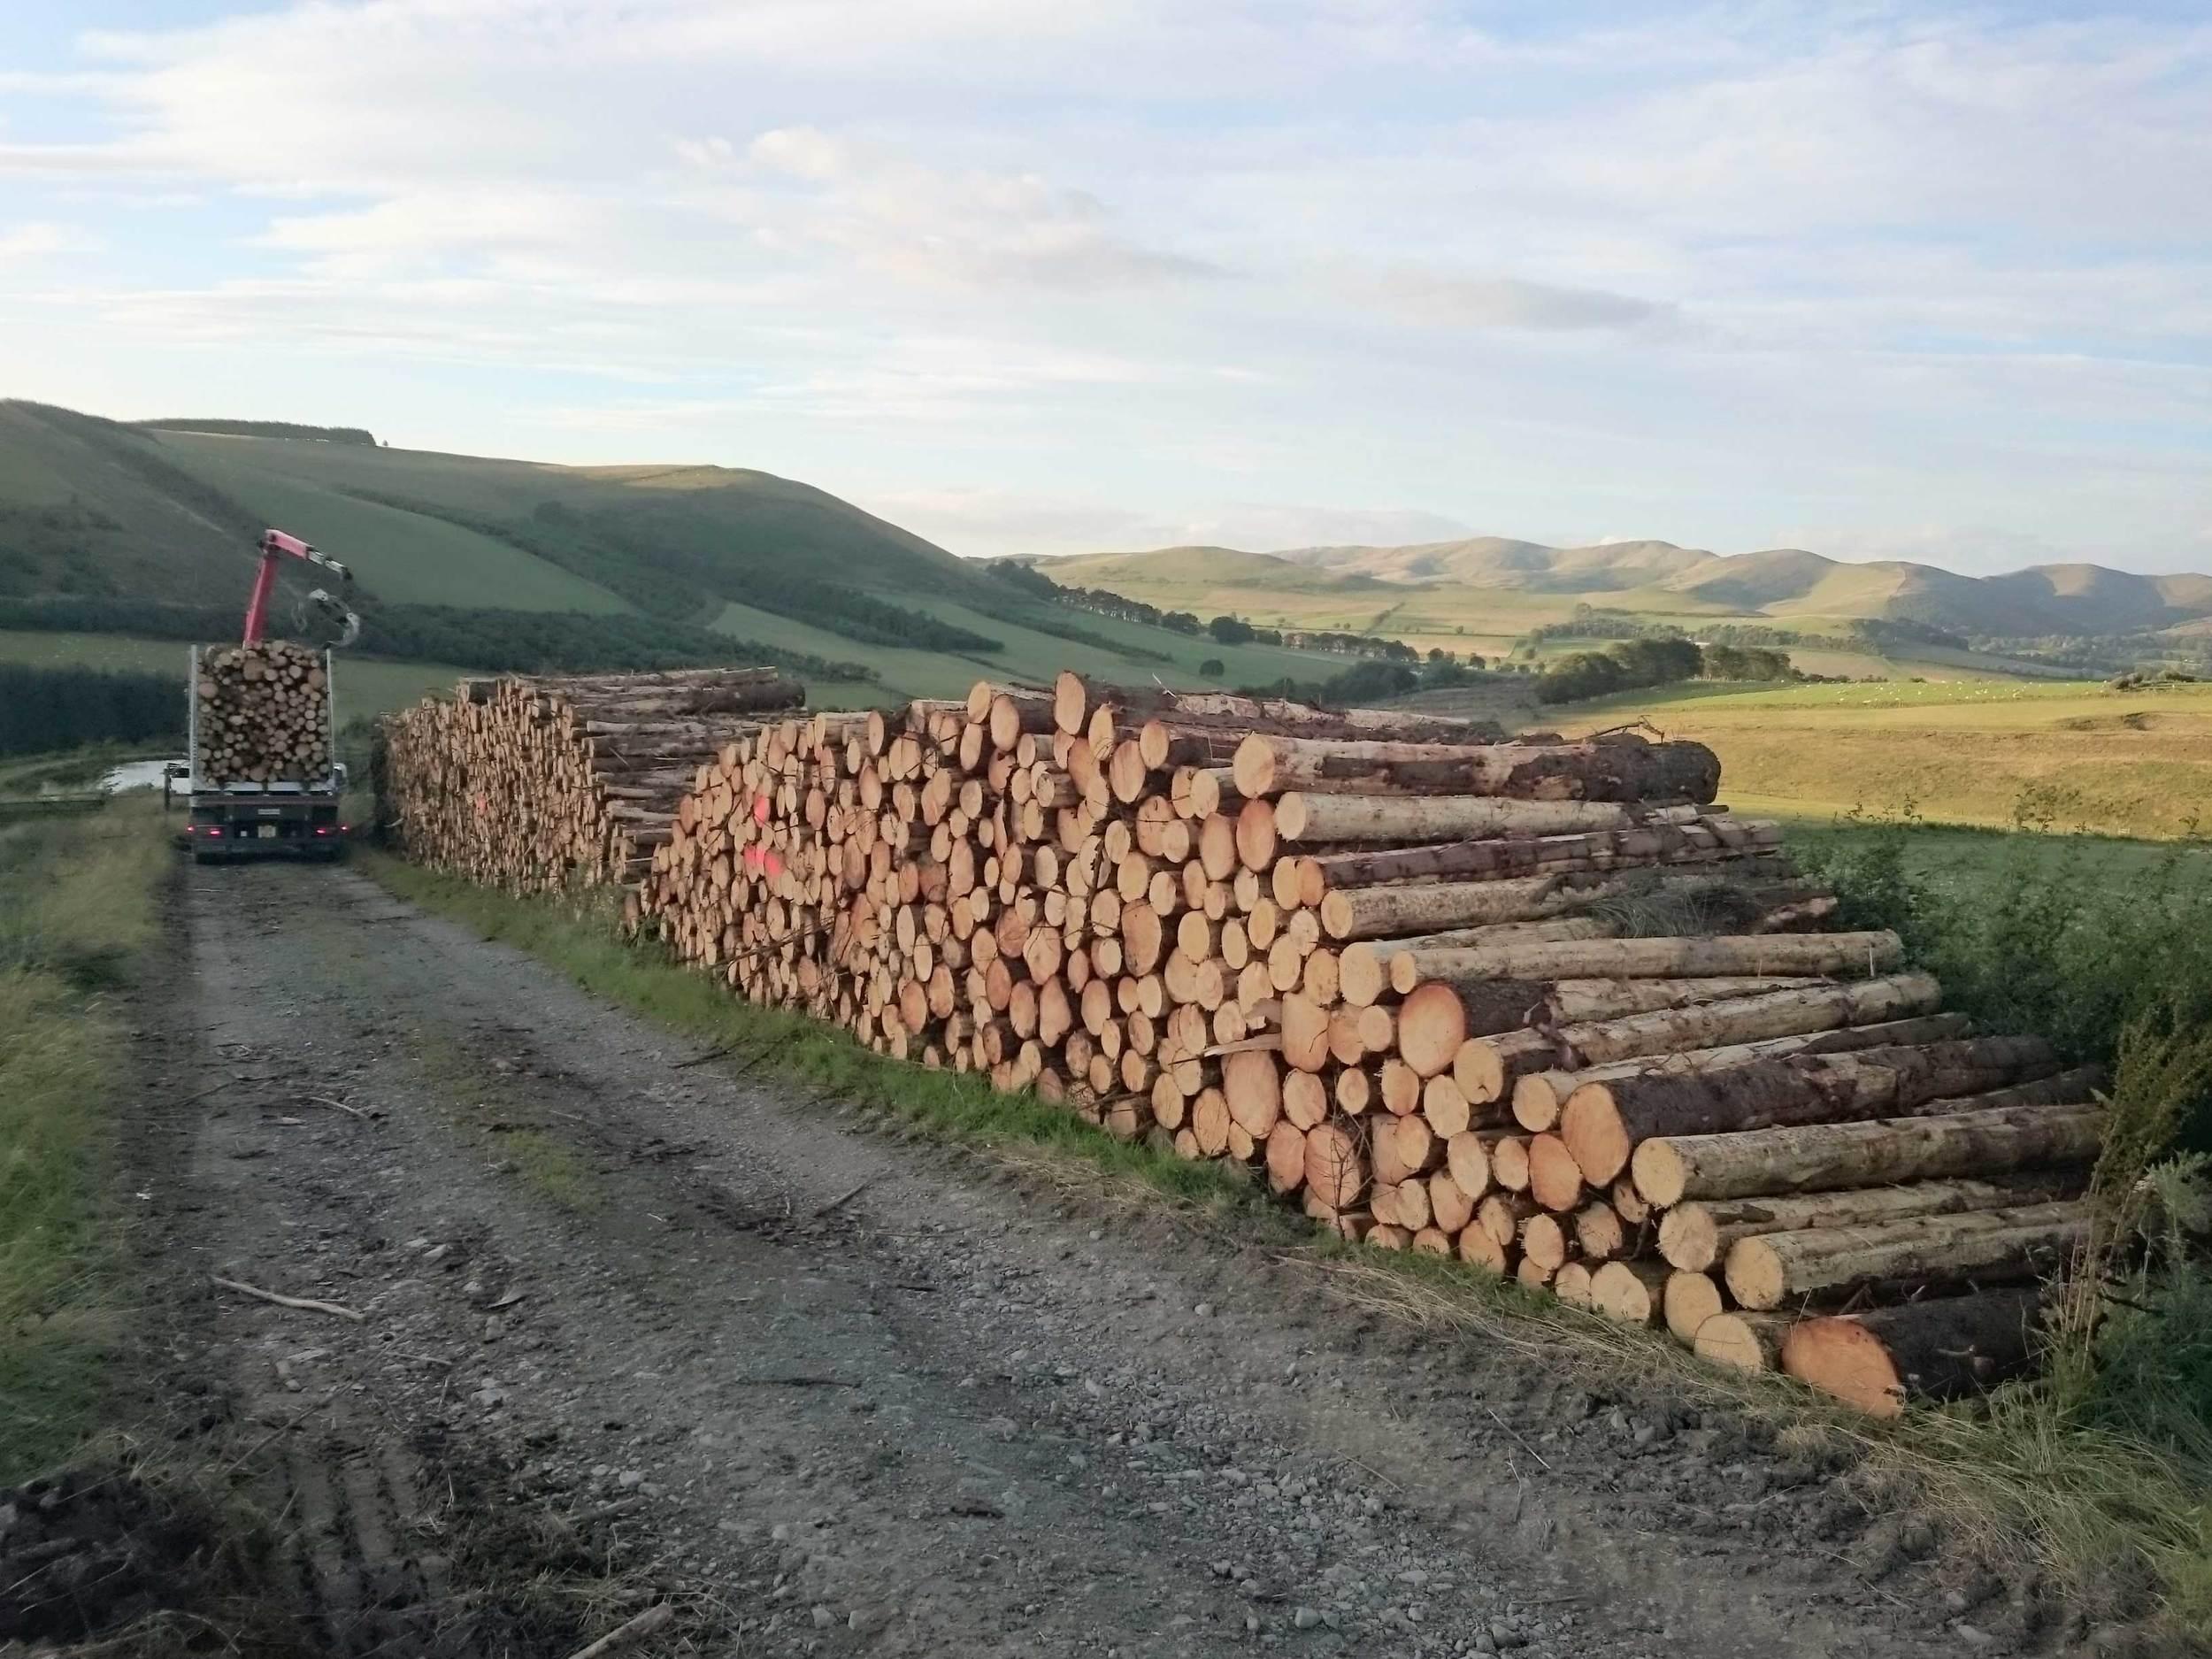 Timber - harvesting